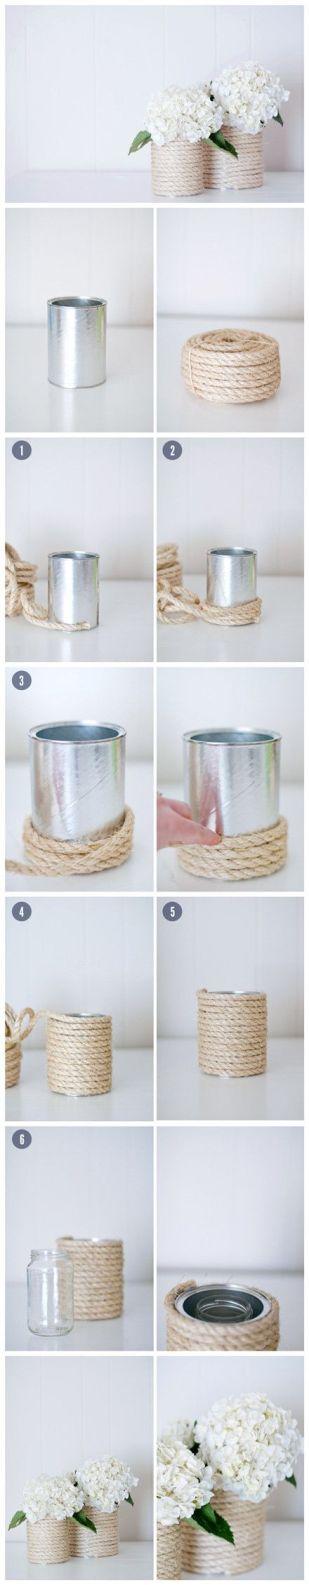 Tutorial para poner bonita una lata de tomate